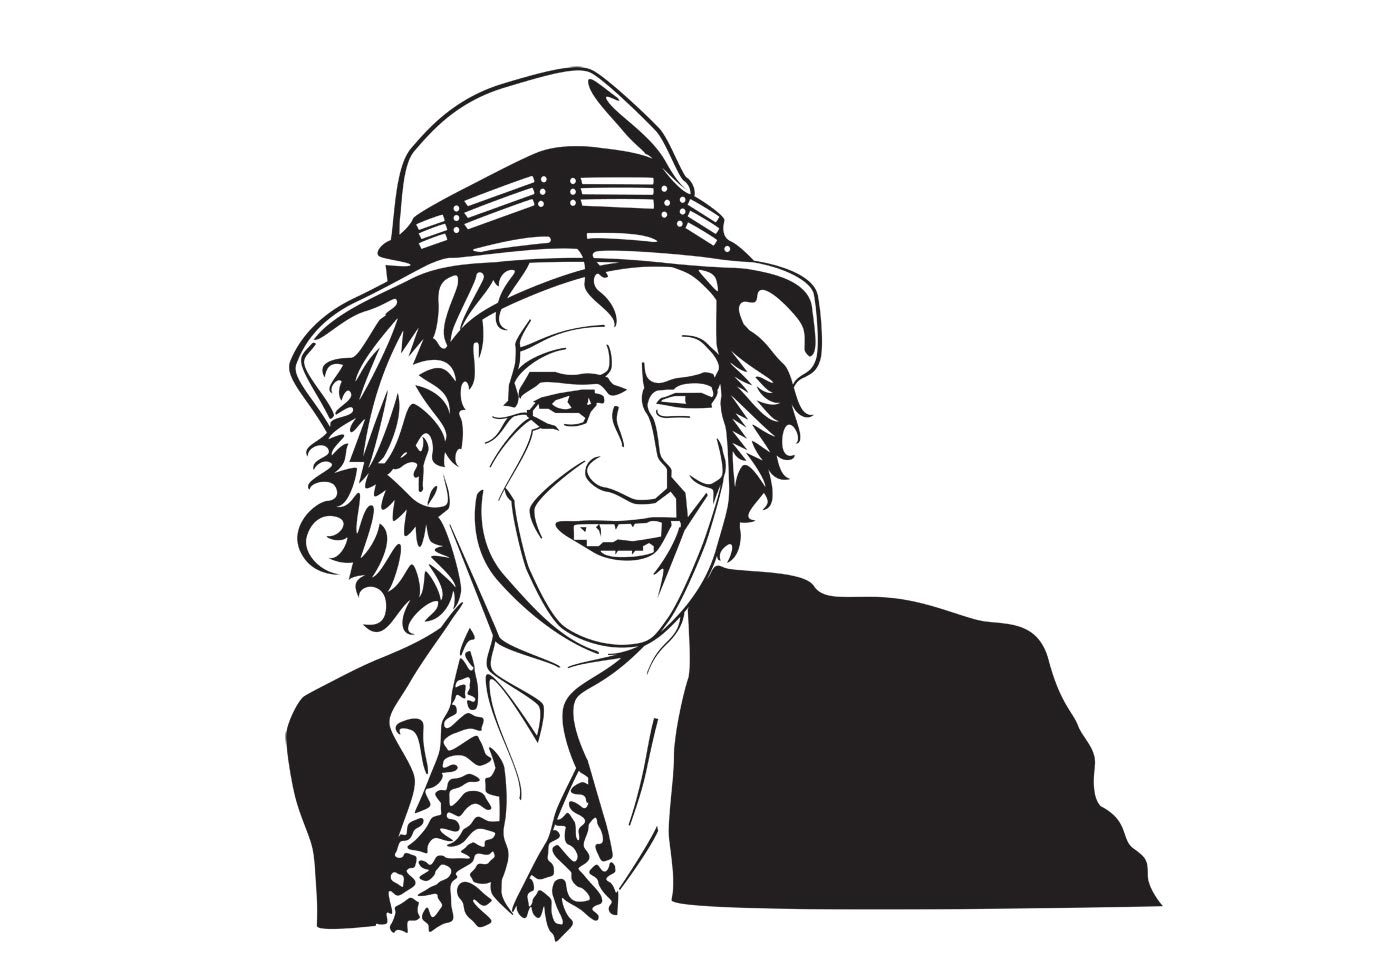 Keith Richards Vector Portrait Download Free Vectors